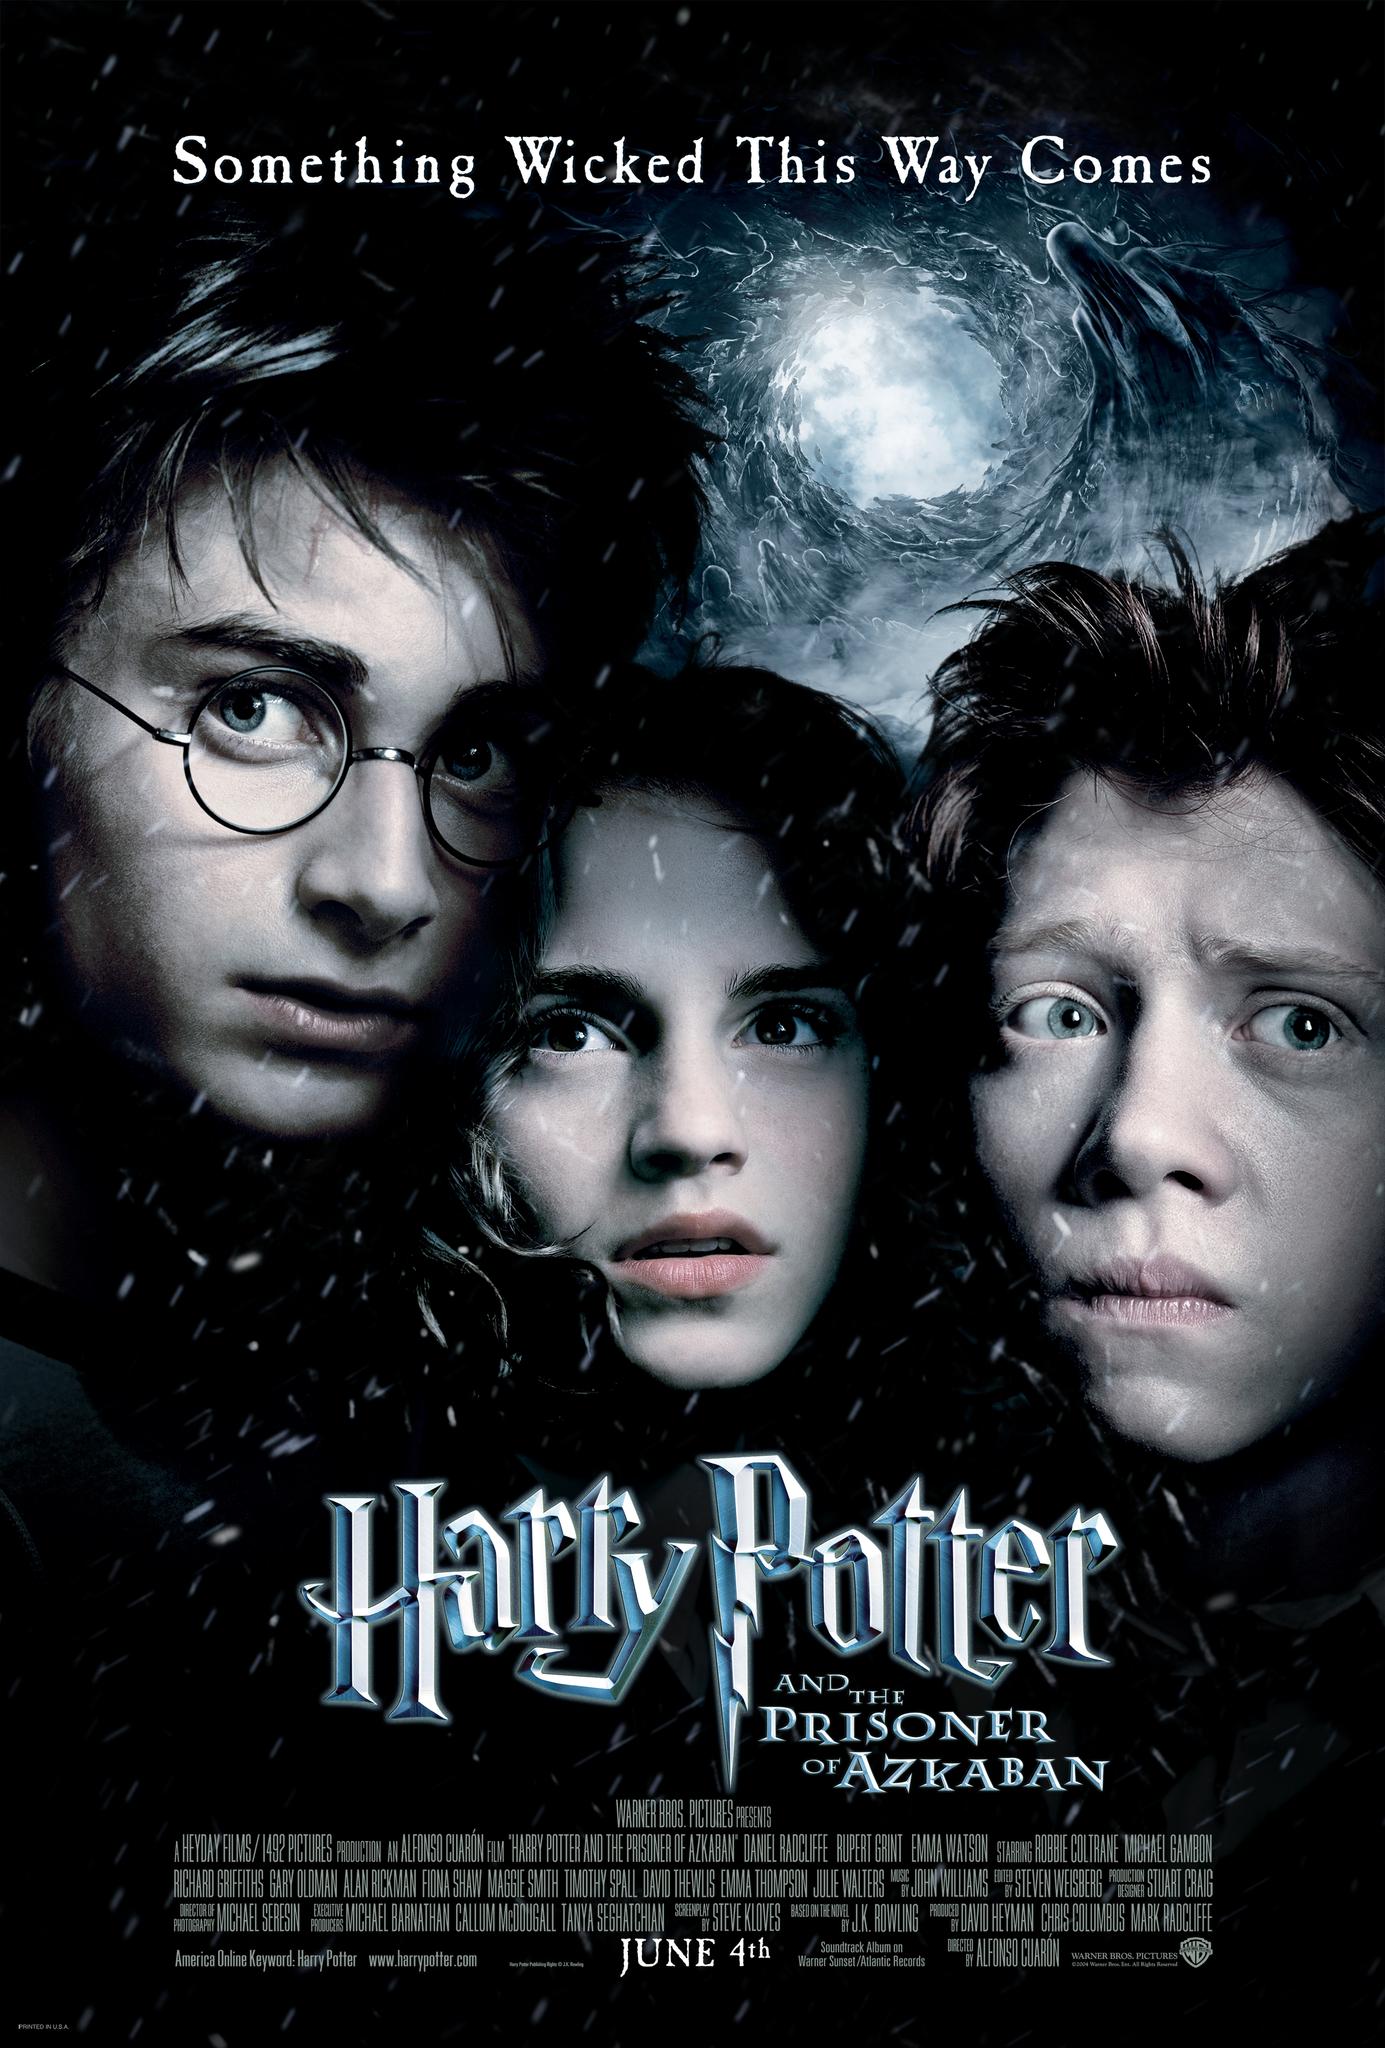 Harry Potter and the Prisoner of Azkaban (2004) BluRay 480p, 720p, 1080p & 4K-2160p